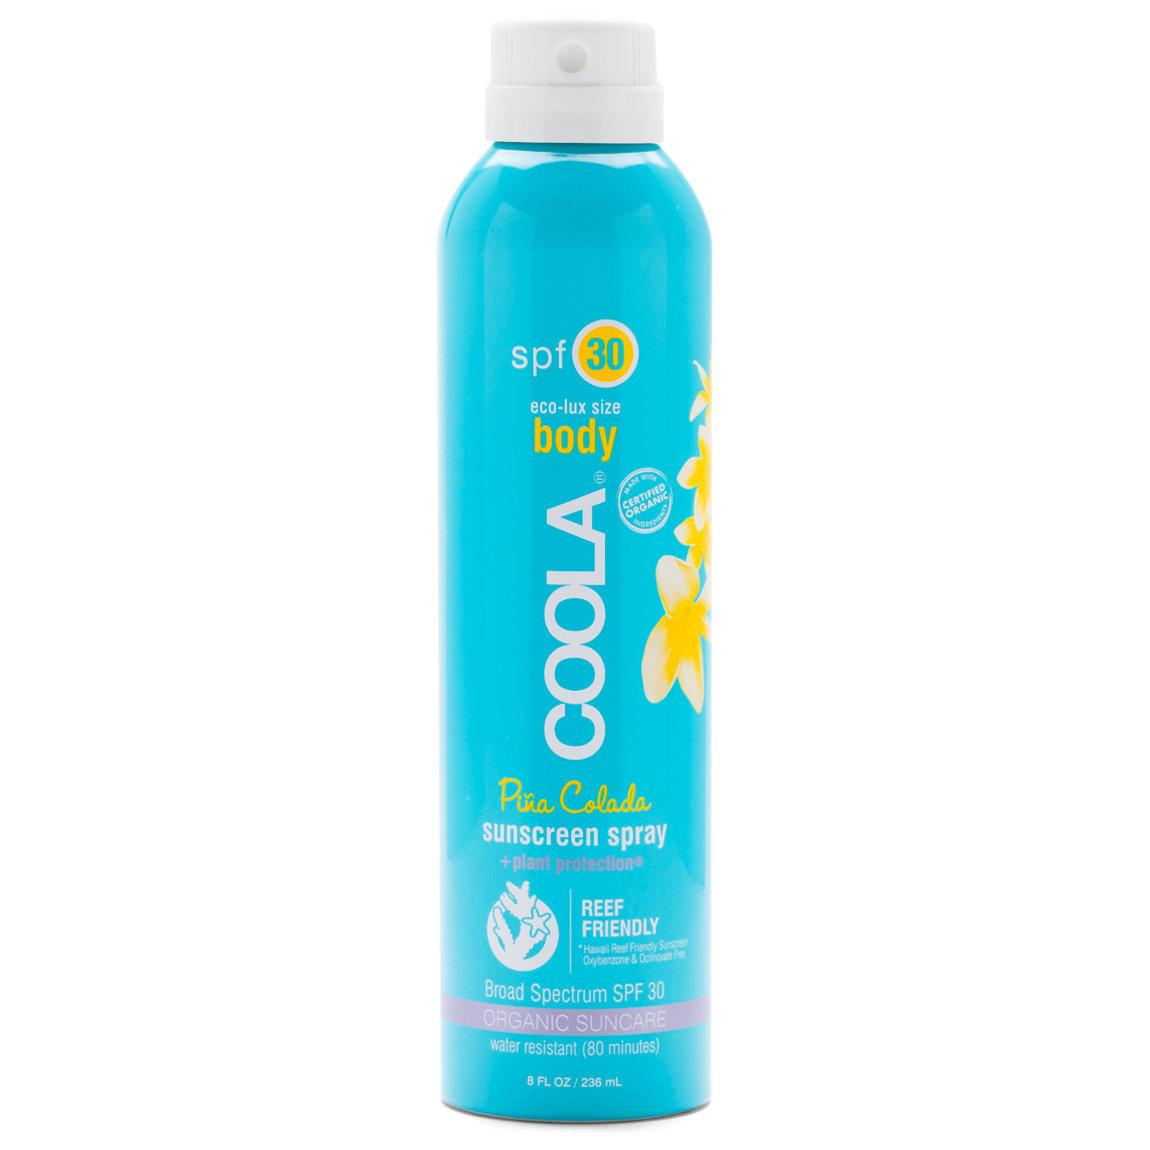 COOLA Eco-Lux Sport Sunscreen Spray SPF 30 Piña Colada product swatch.